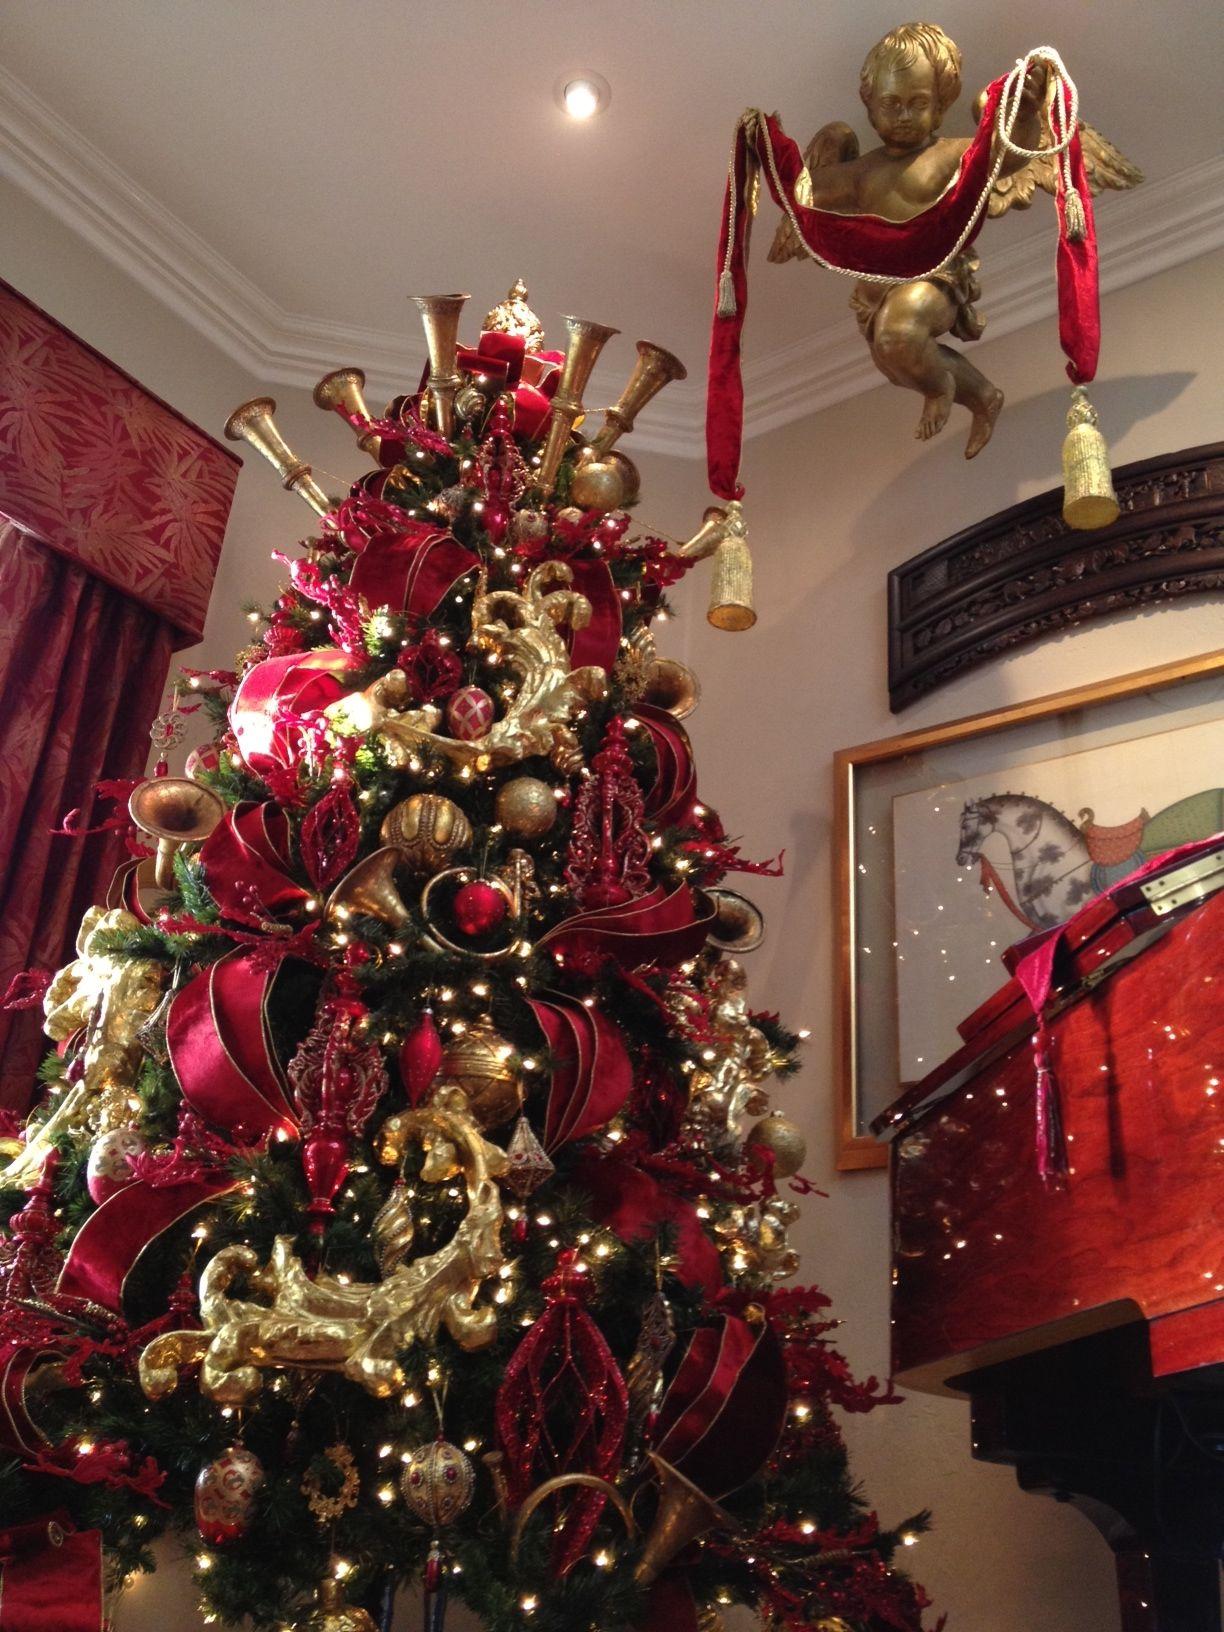 Cherub Christmas tree topper Exquisite professional Christmas ...